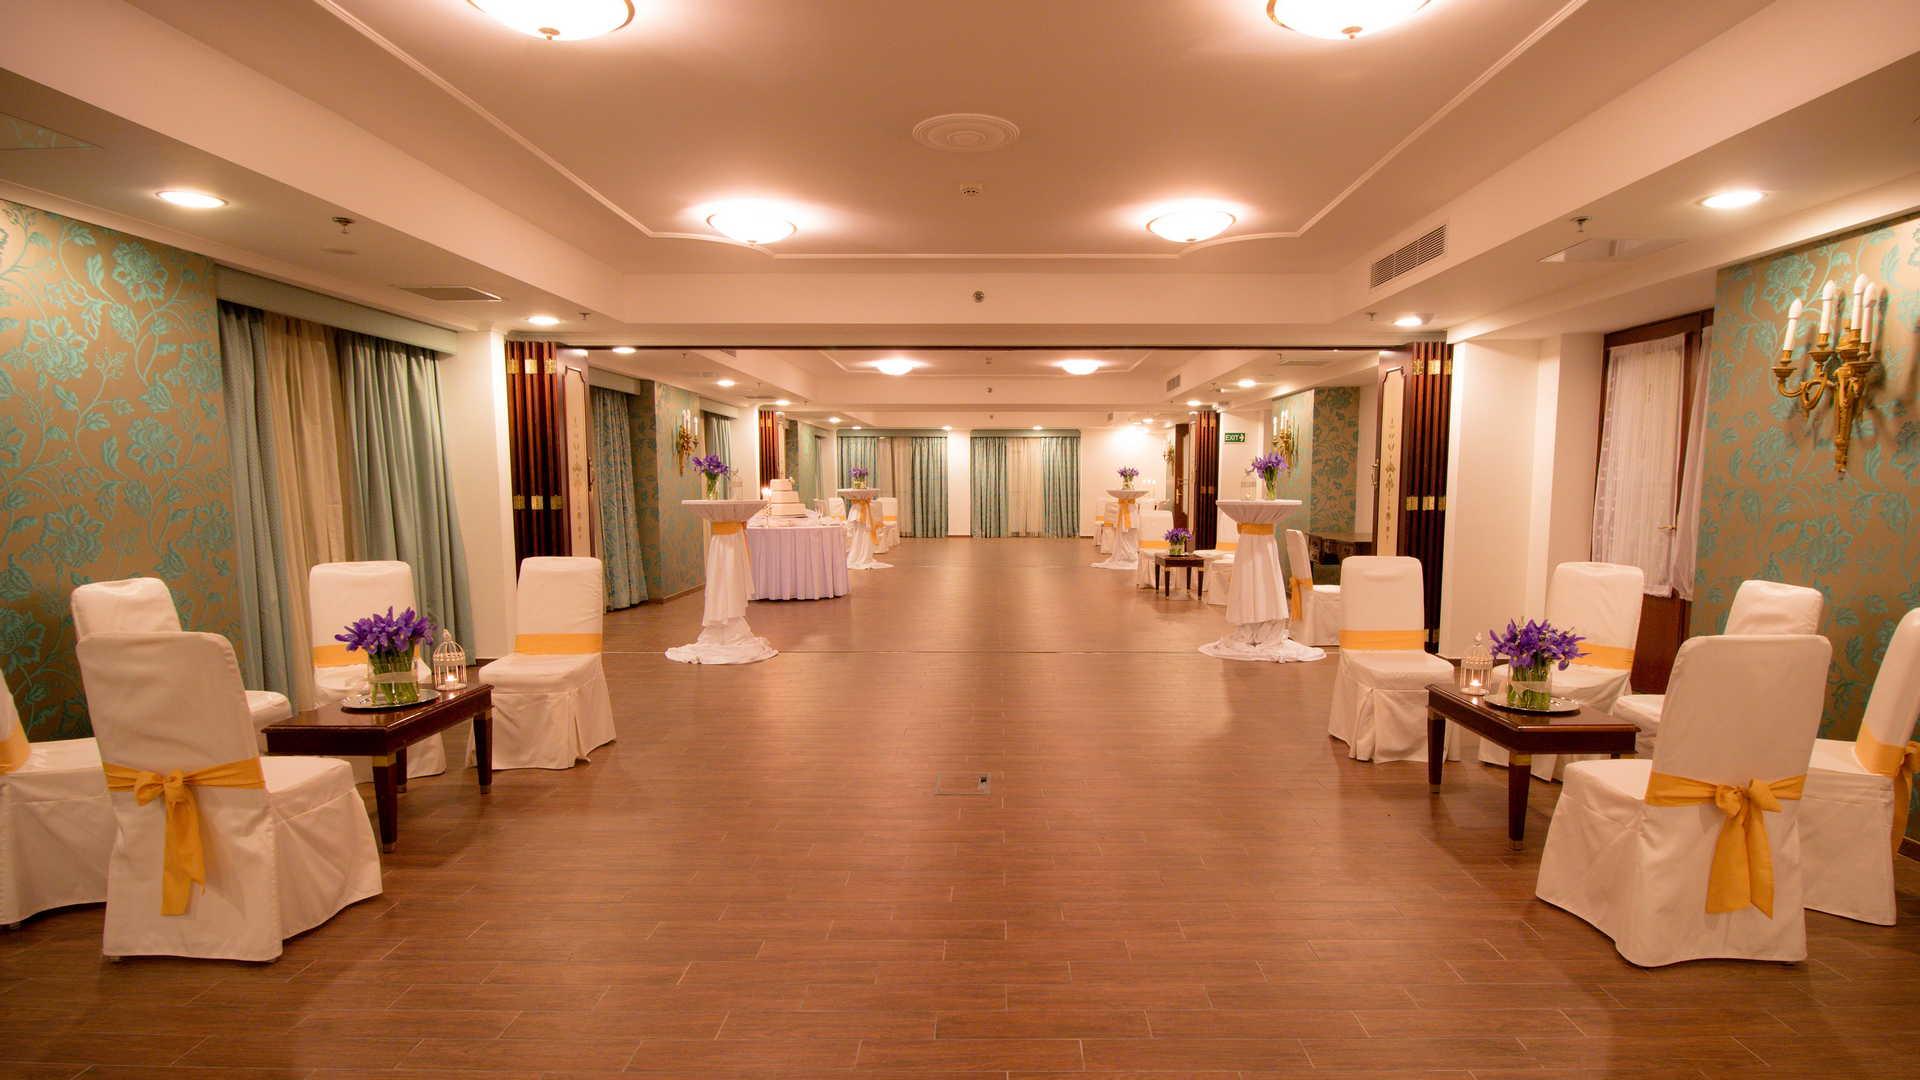 AX The Victoria Hotel - William Shakespeare Wedding Event